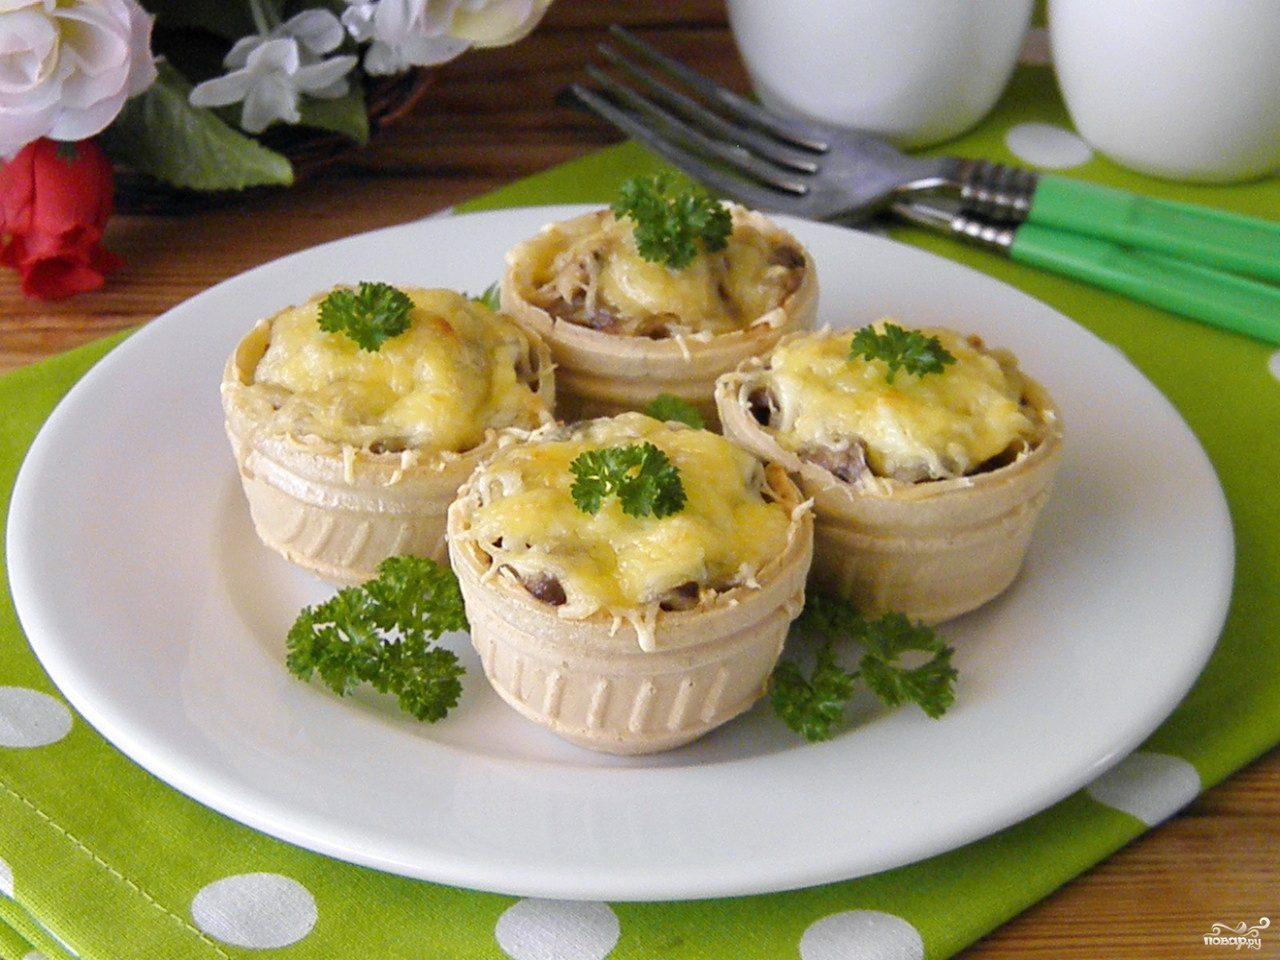 тарталетки с грибами и курицей рецепт с фото пошагово